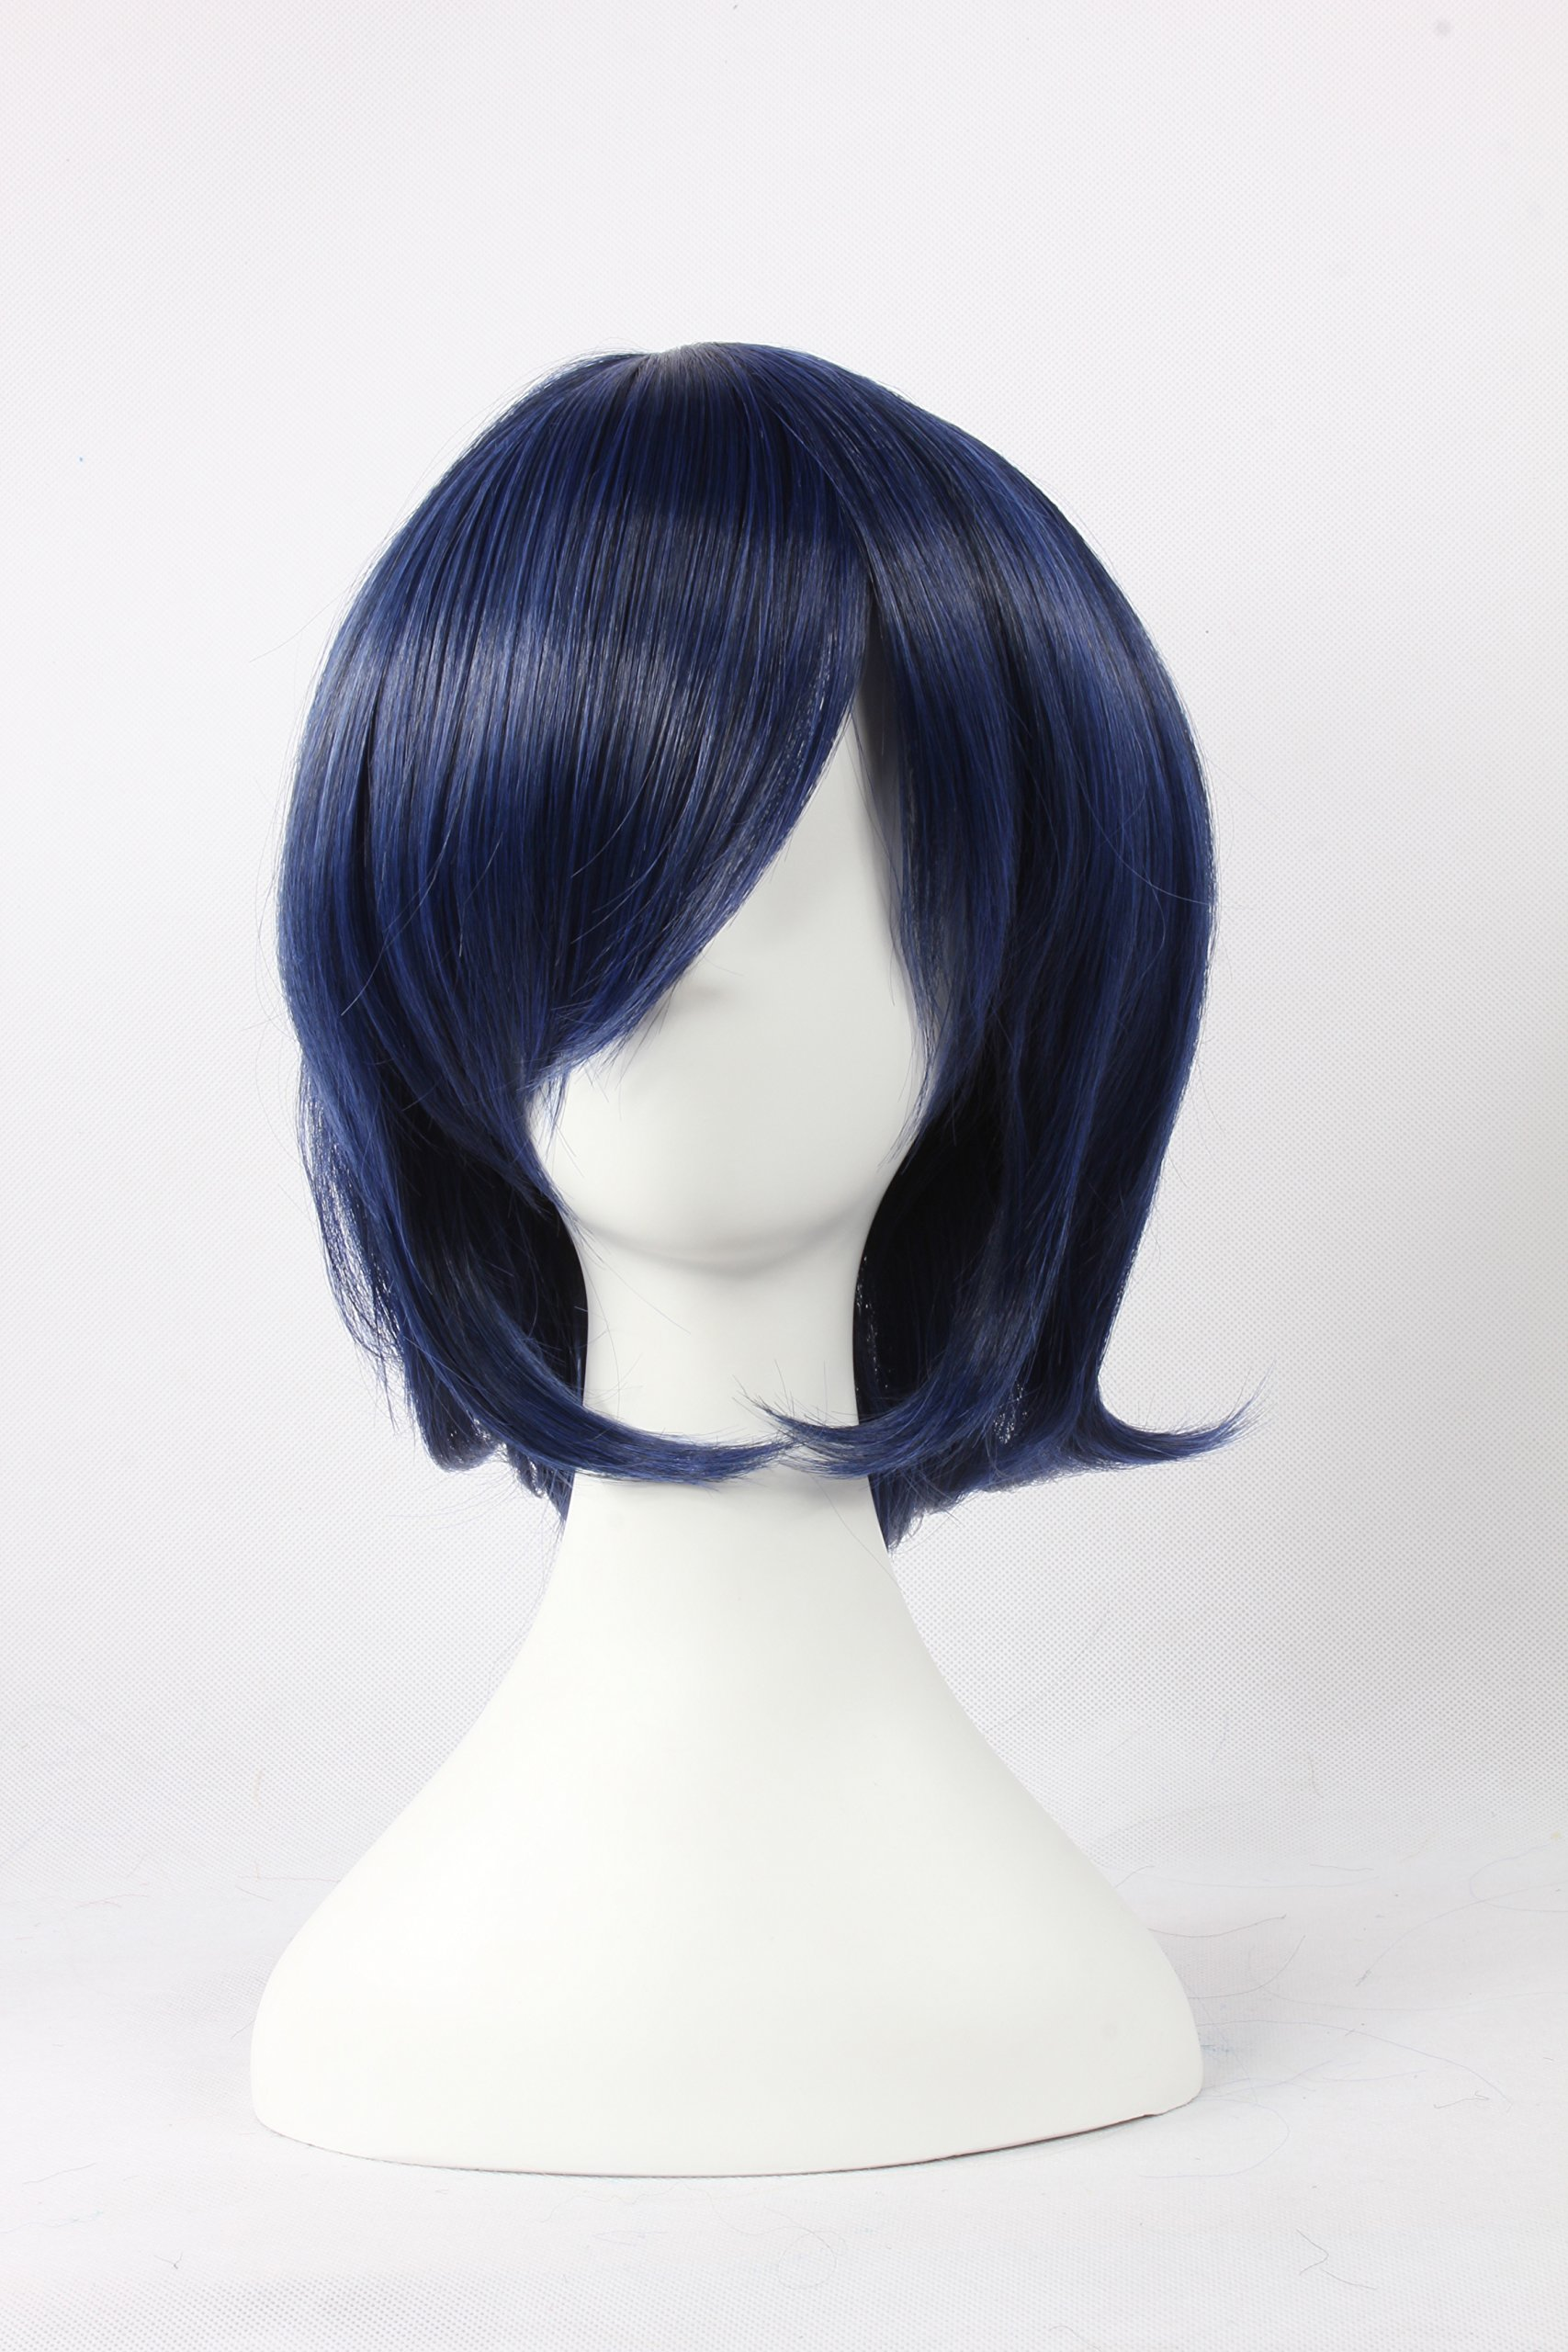 Coolsky Wigs GurrenLagann ,The Prince of Tennis ,SAILOR MOON Mix Dark Blue Hair Cosplay